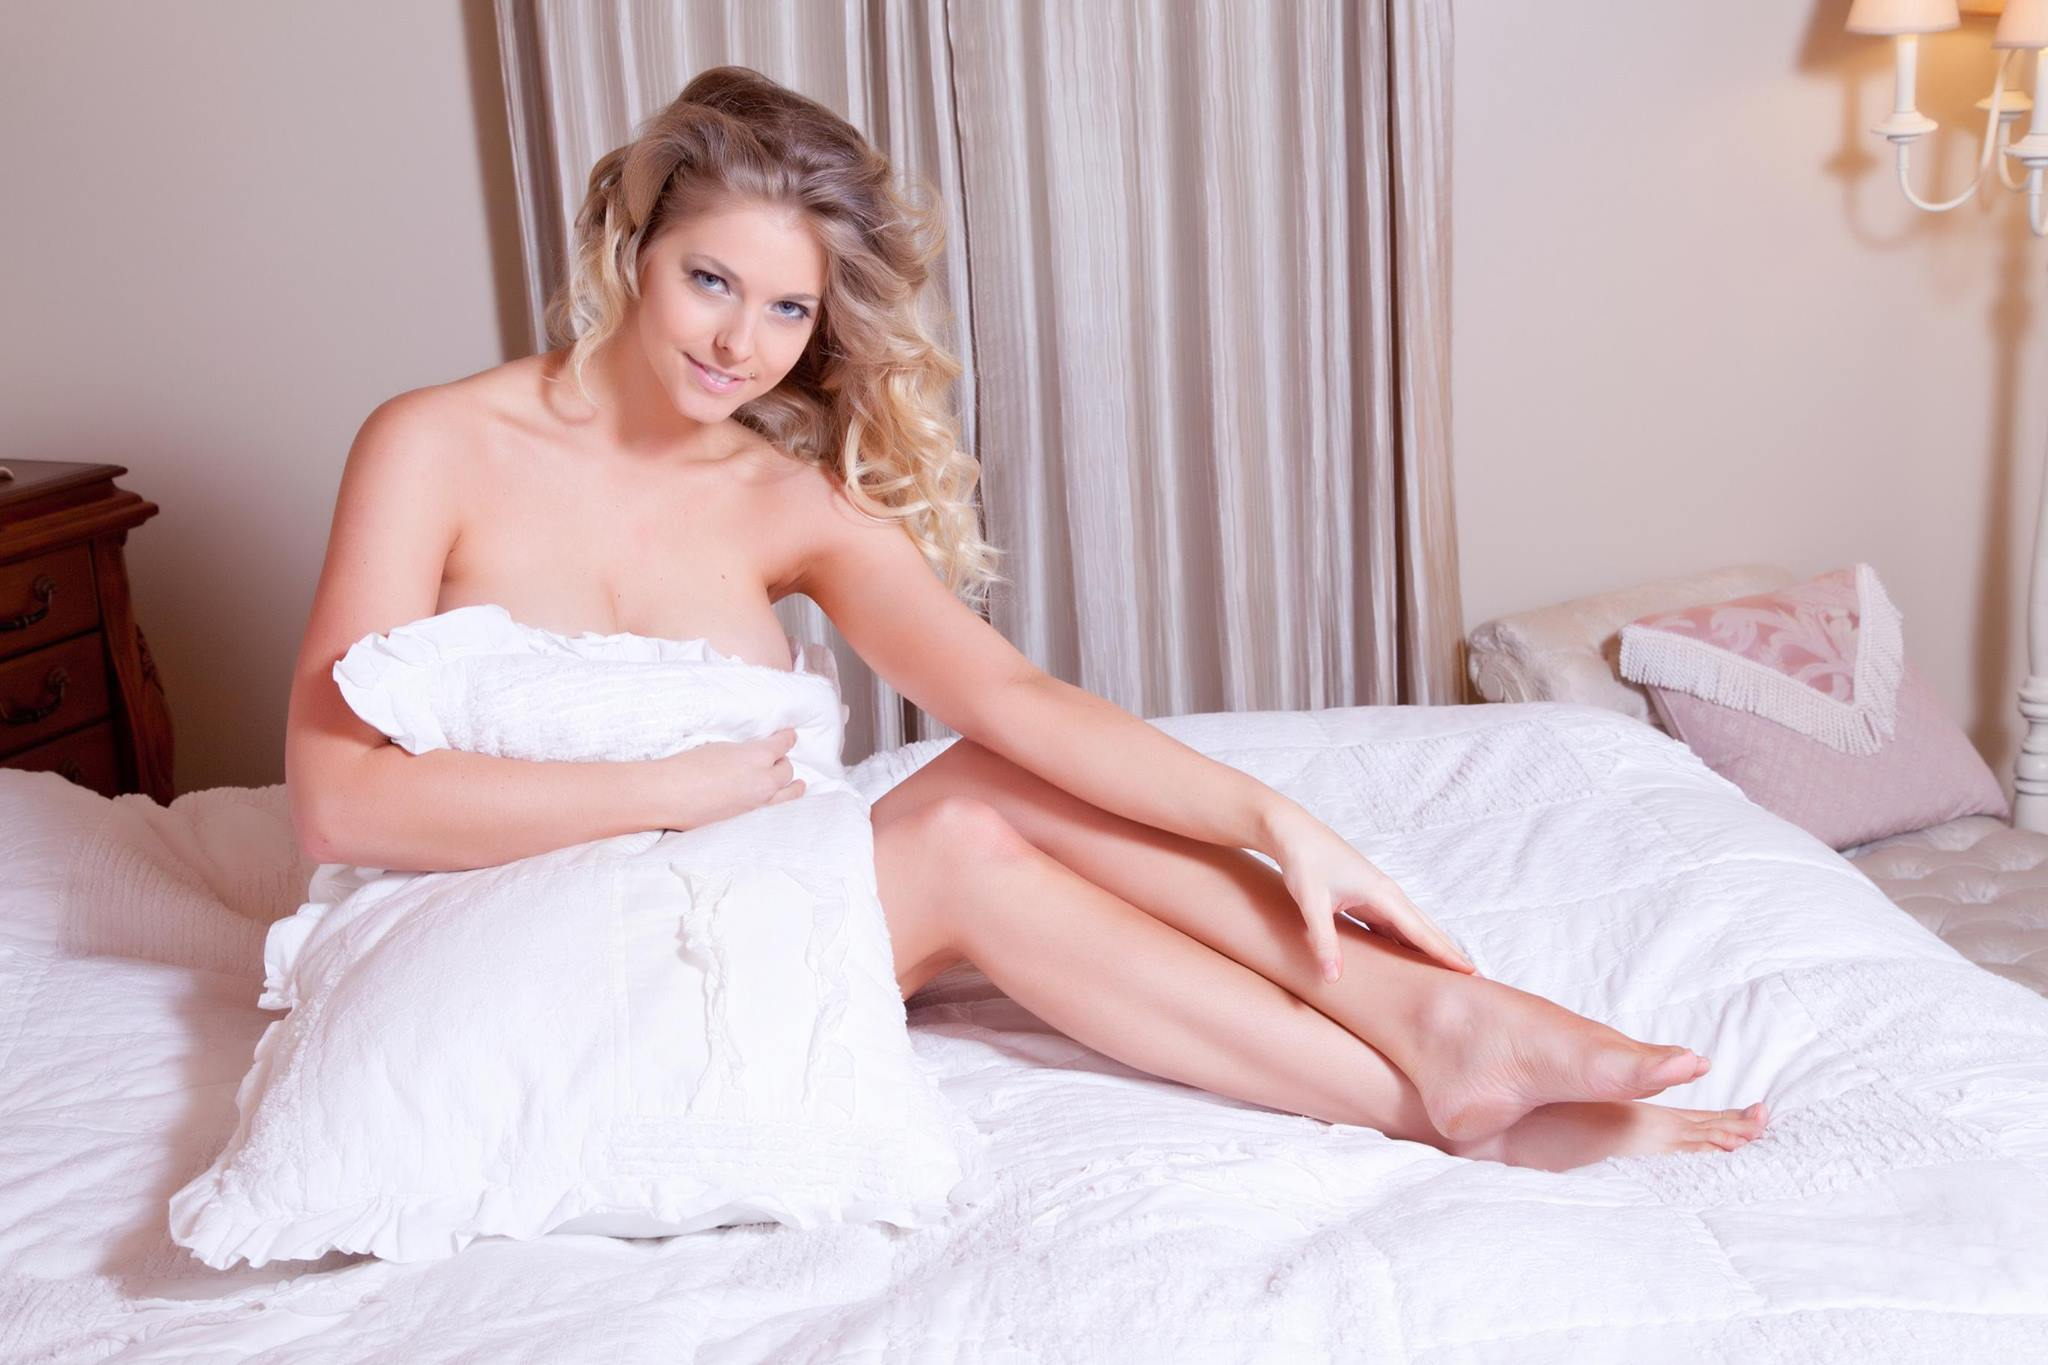 Victoria Winters's Feet